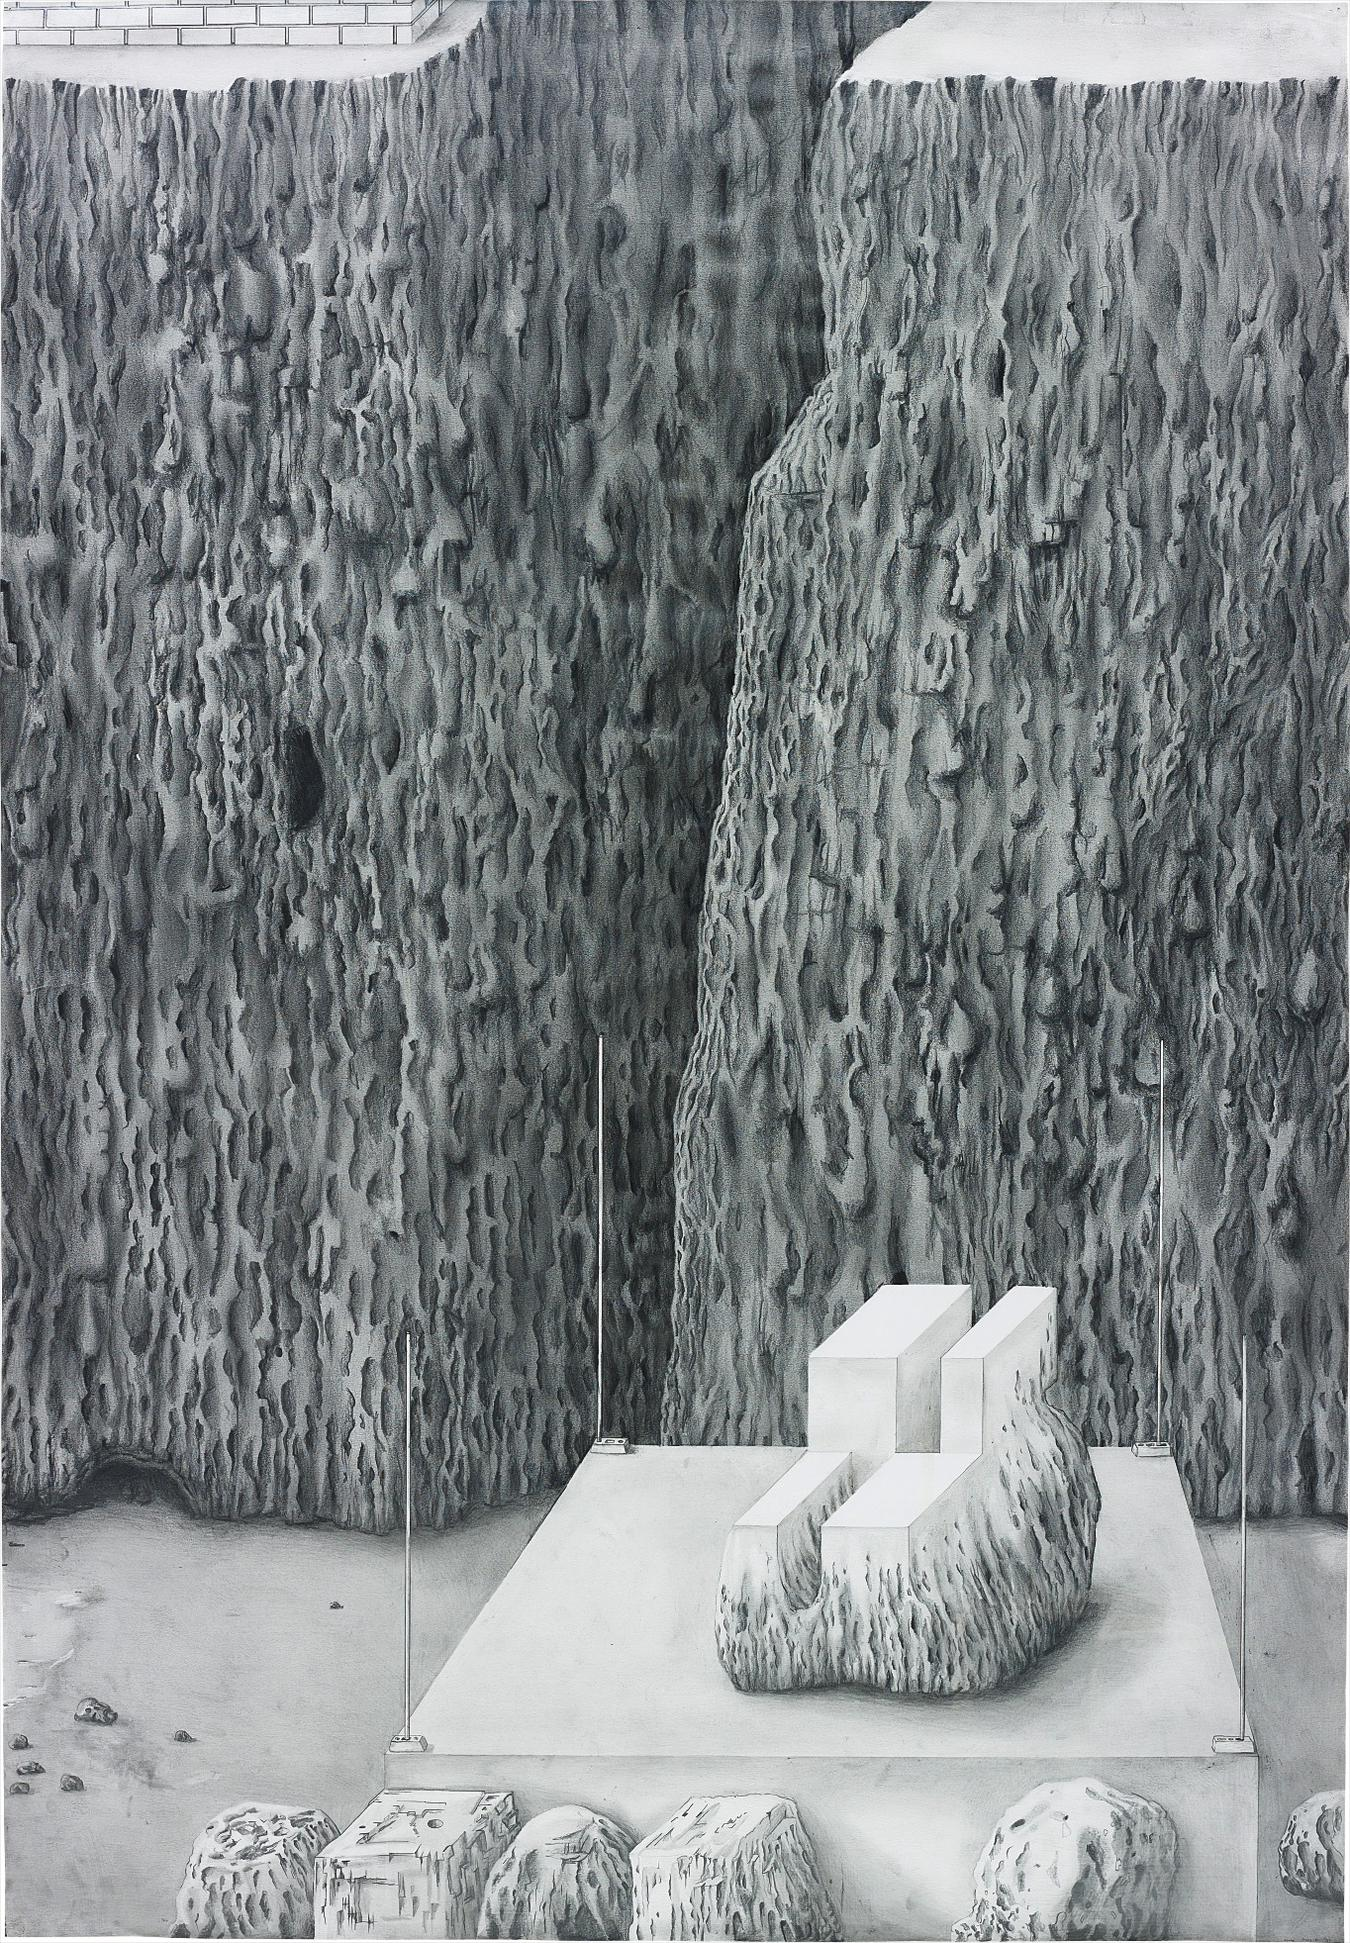 Paul Noble-Quarry N-1997